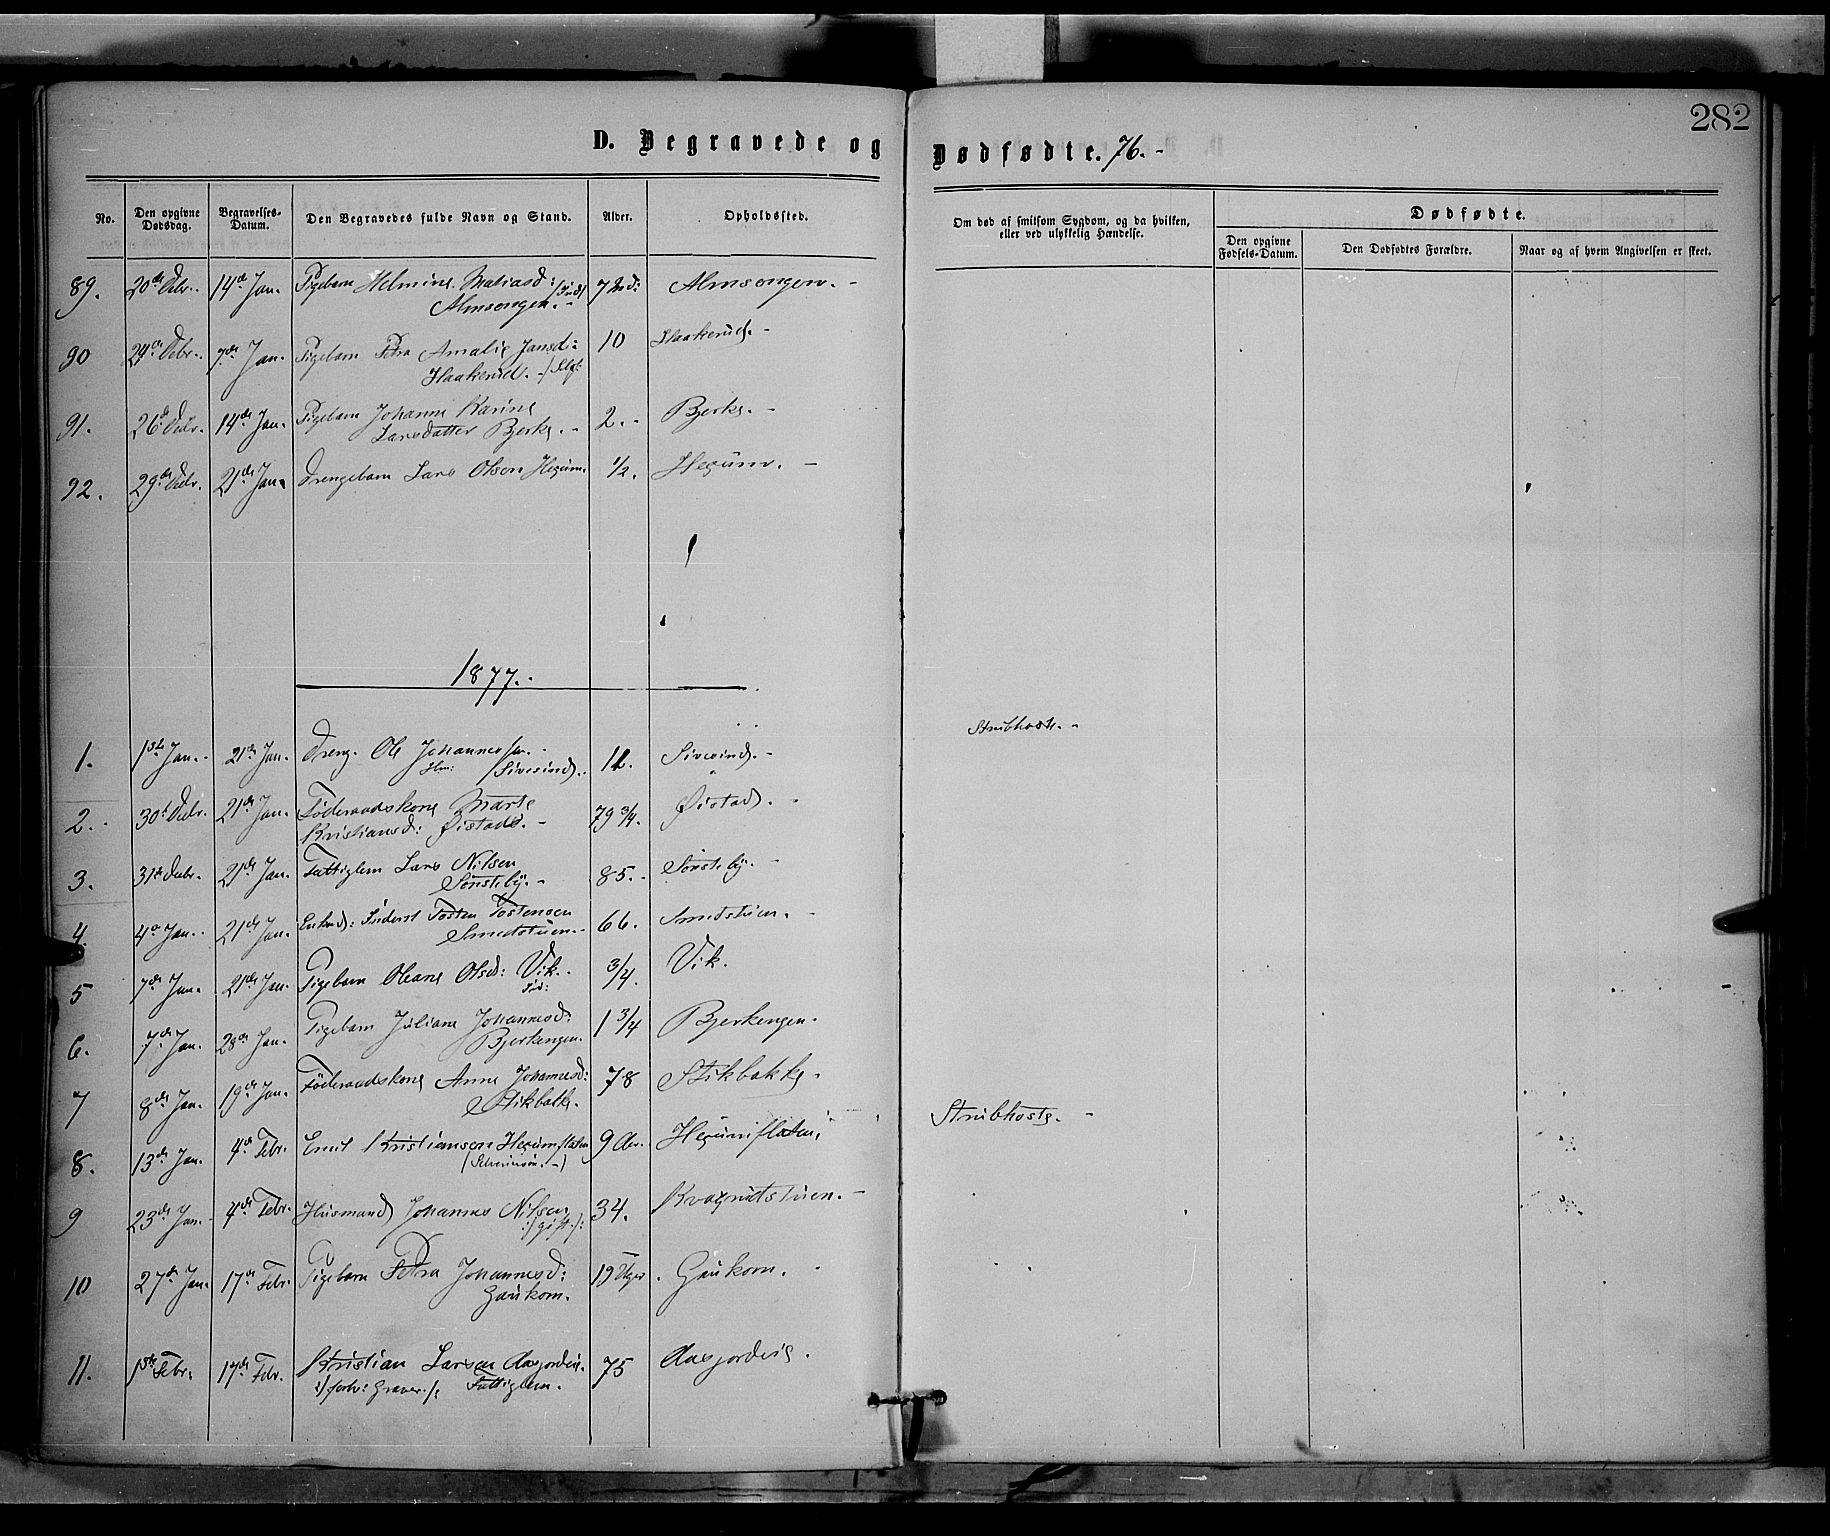 SAH, Vestre Toten prestekontor, H/Ha/Haa/L0008: Ministerialbok nr. 8, 1870-1877, s. 282